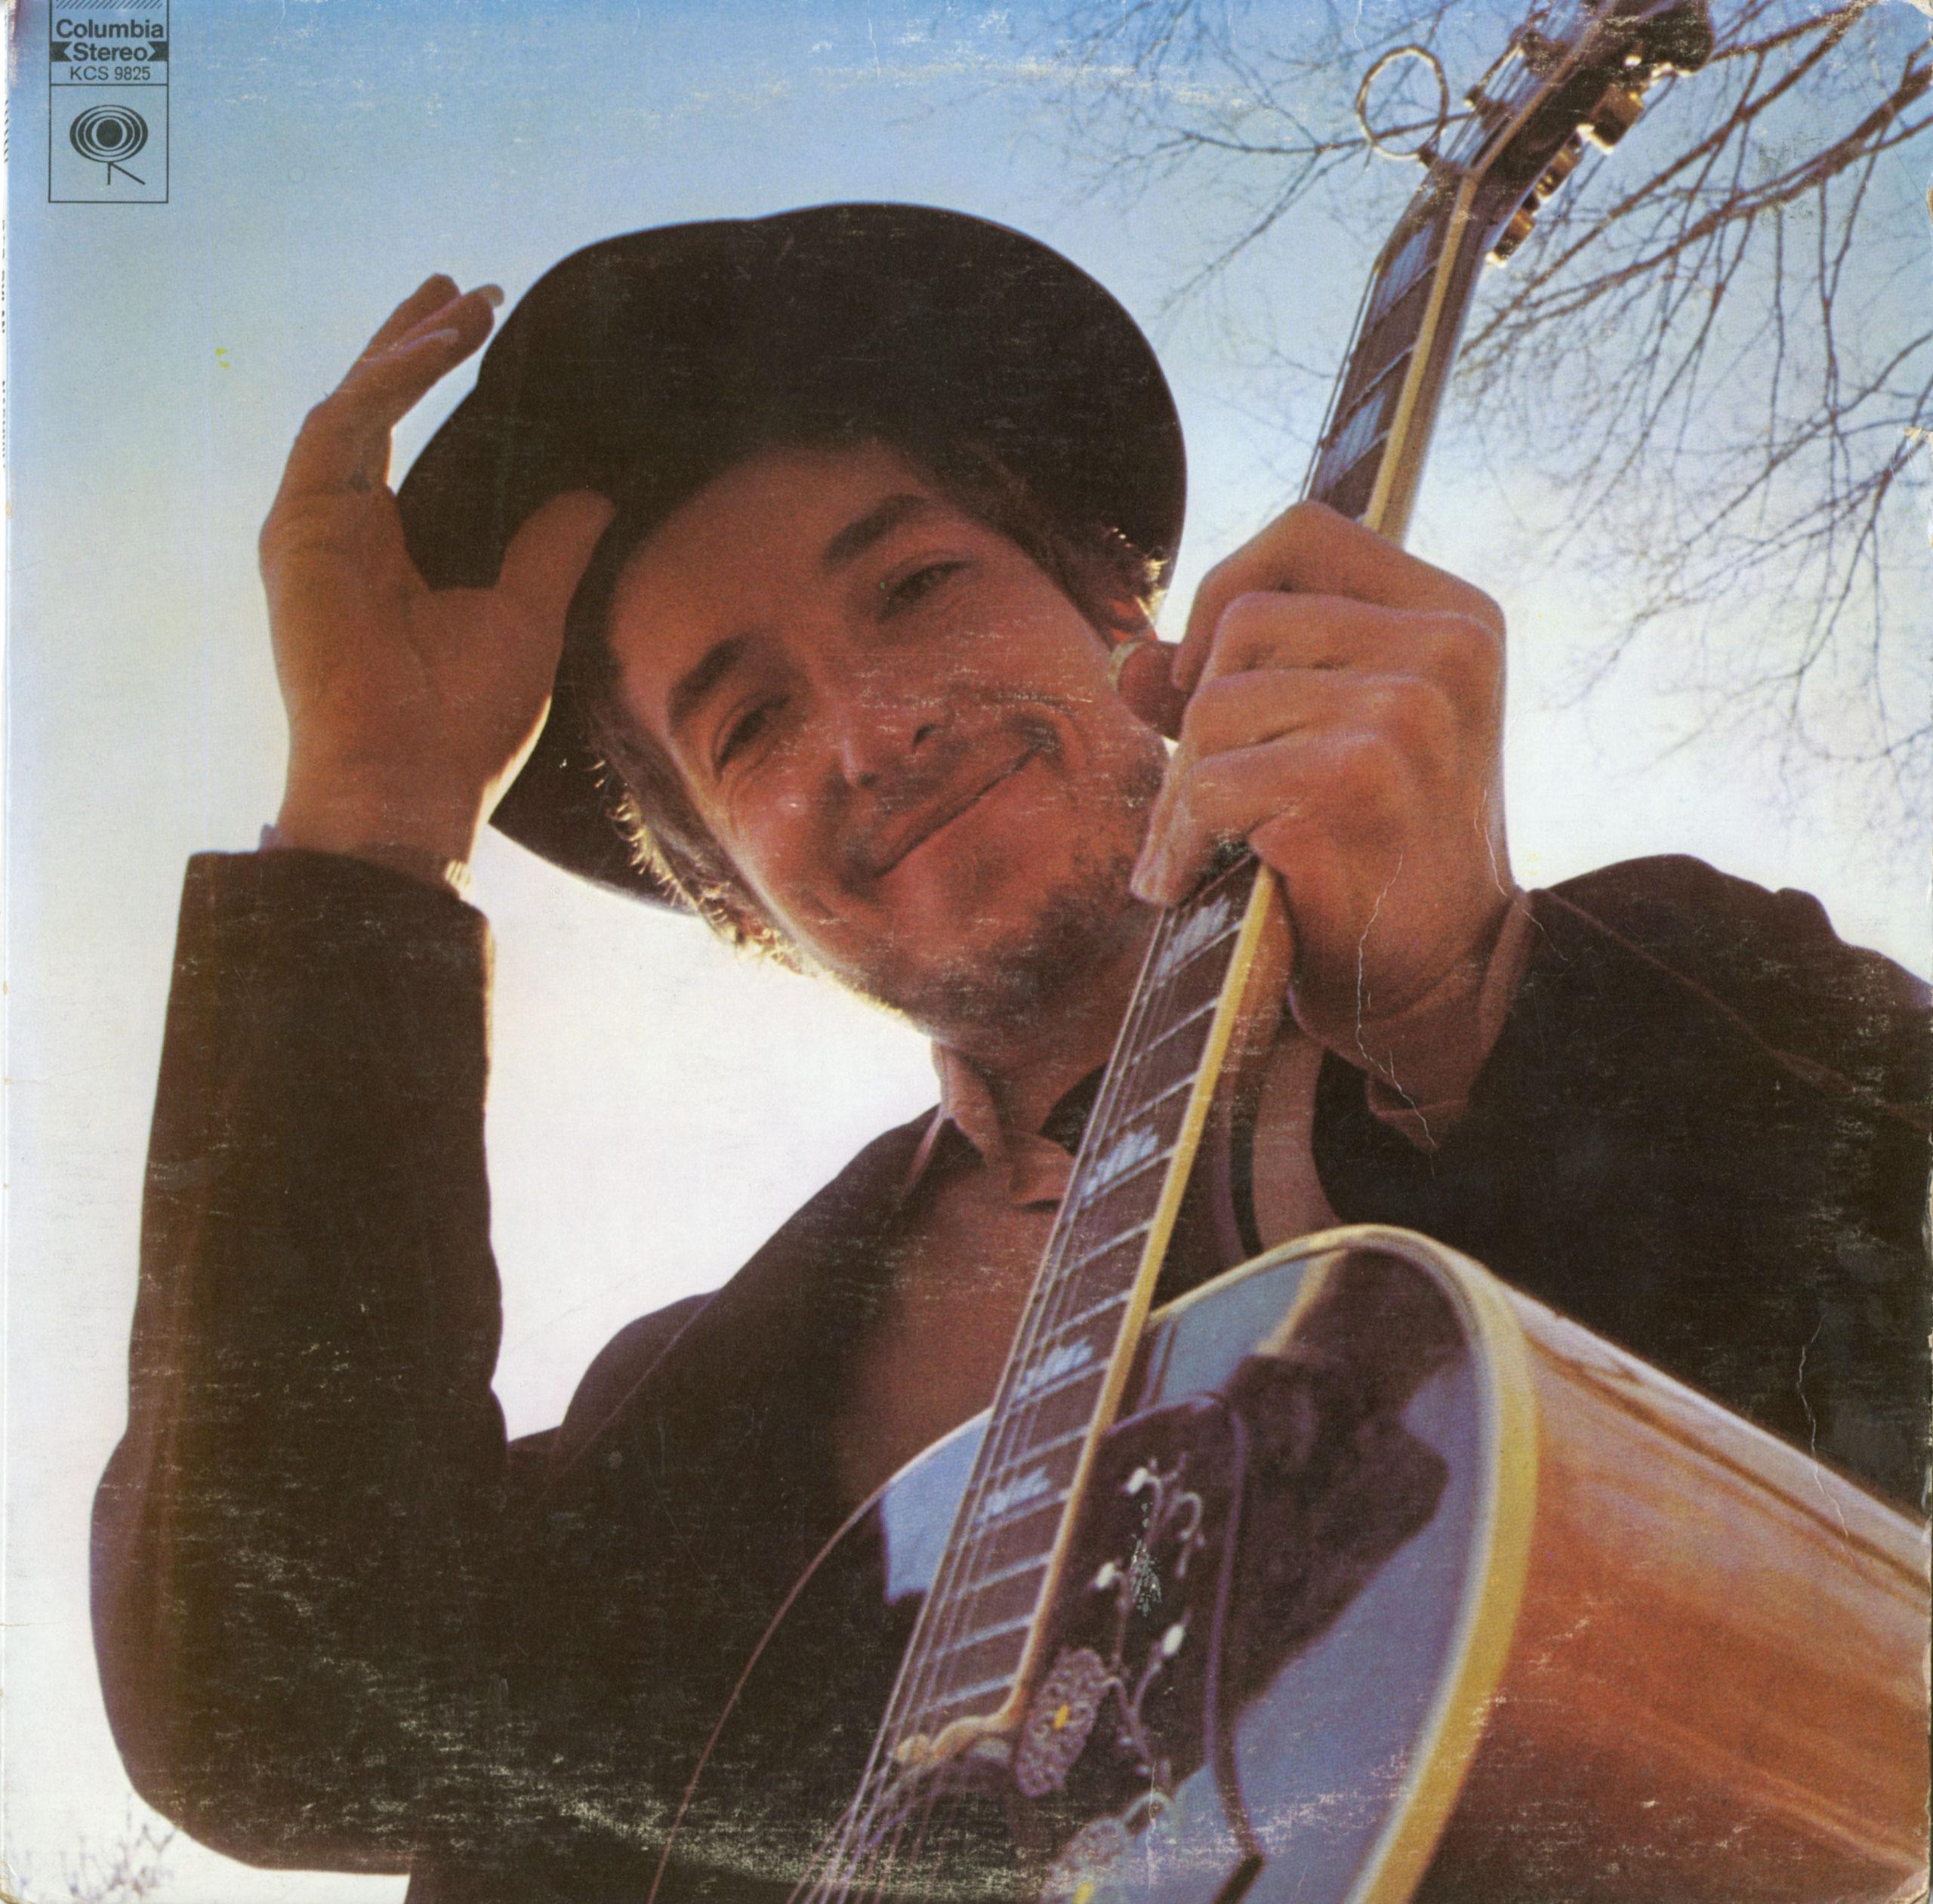 Bob Dylan: Nashville Skyline.